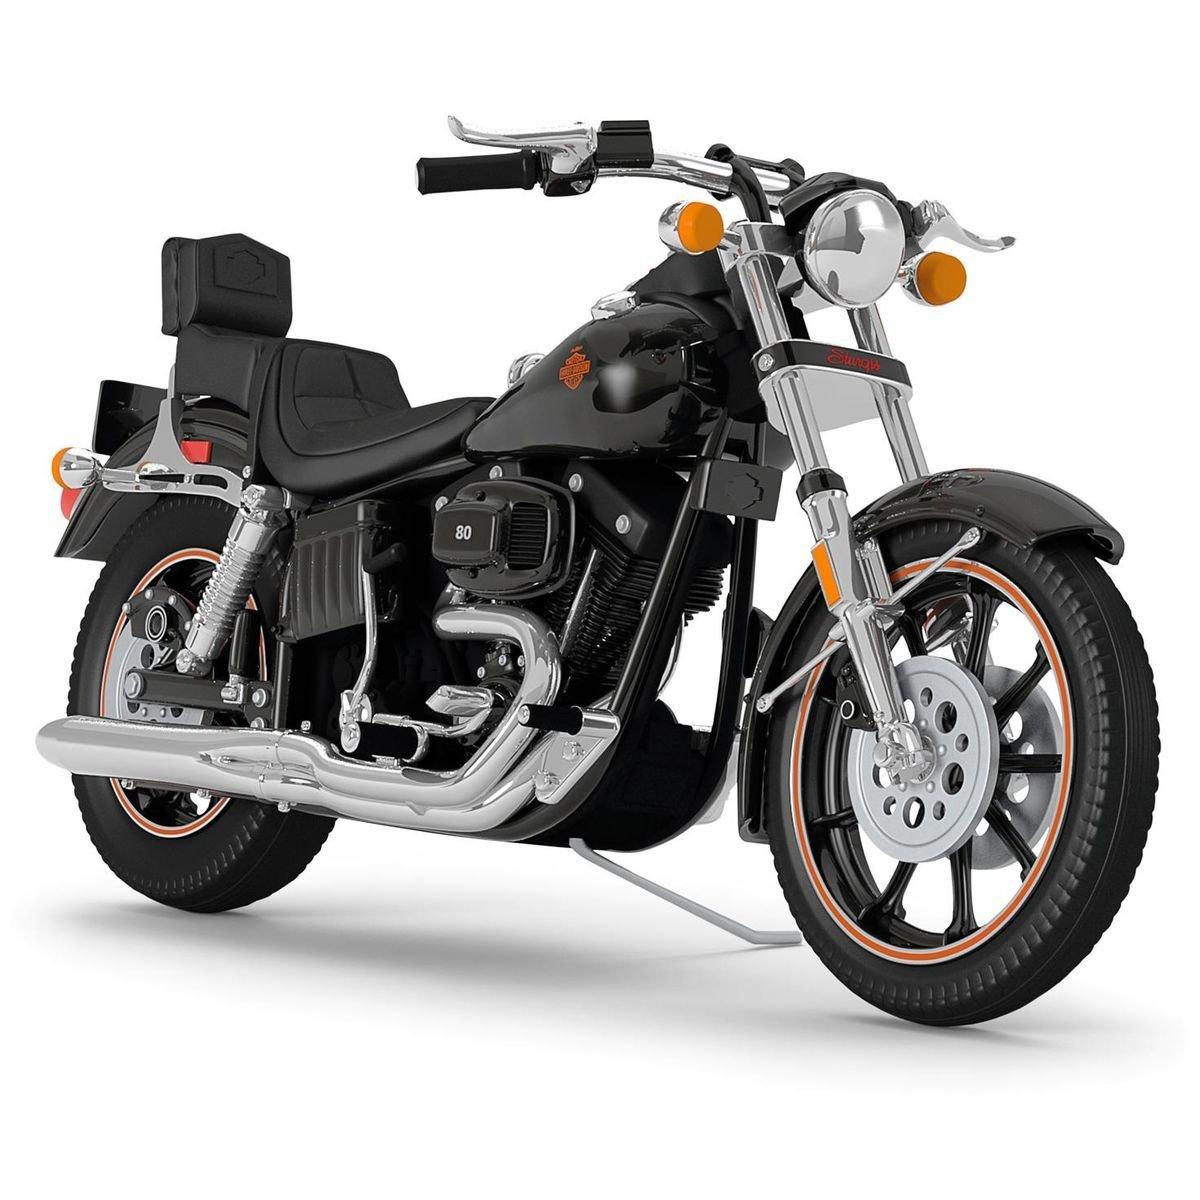 1980 FXB Sturgis Harley-Davidson Motorcycle 2016 Hallmark Keepsake Ornament B01MTKNKB7